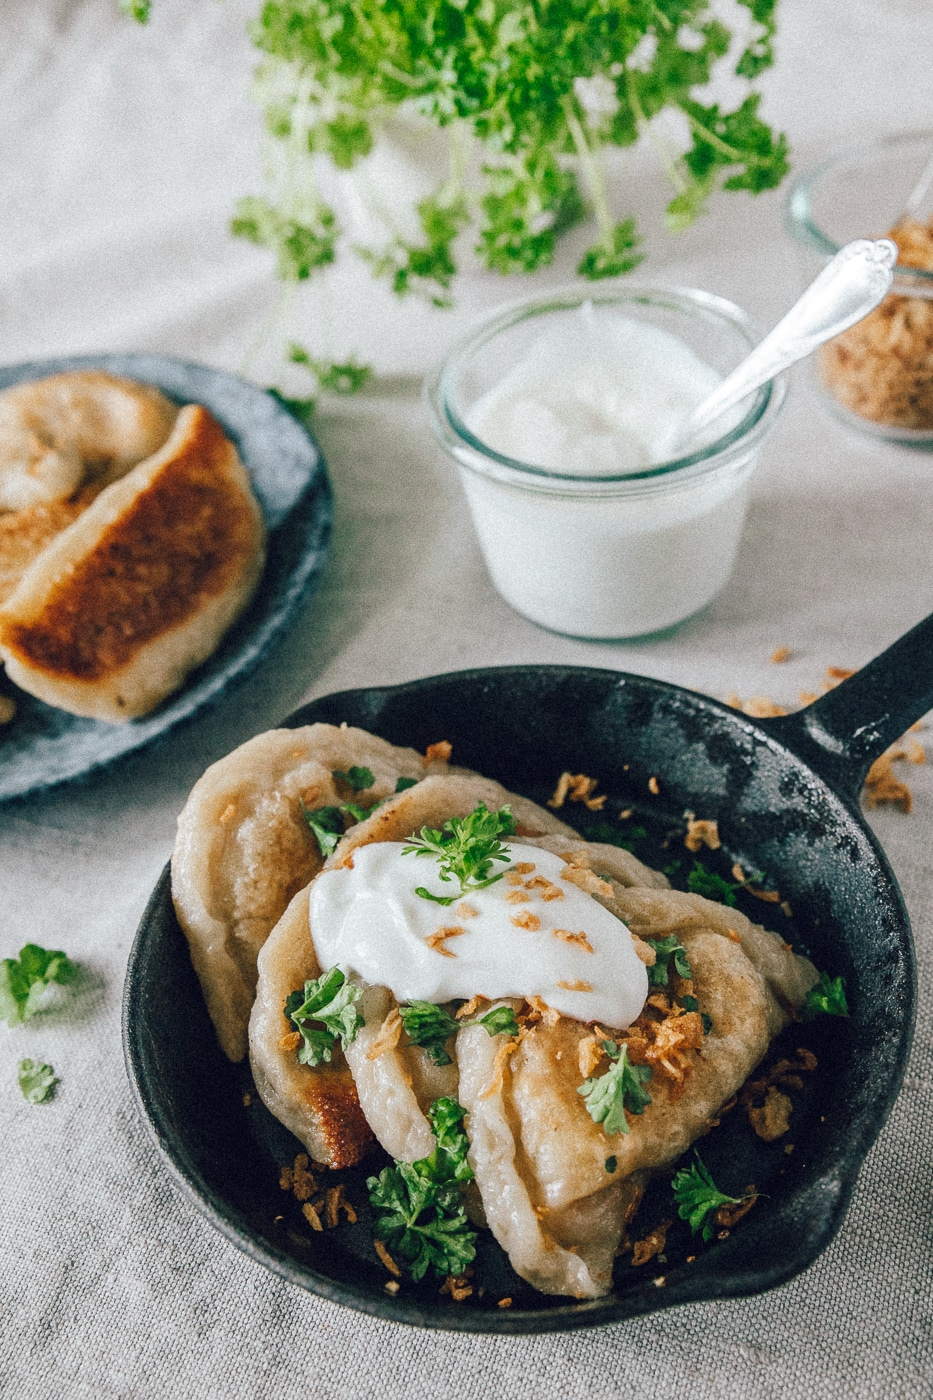 russiske vareniki, fryseegnet mad, kartoffelmos, ristede løg